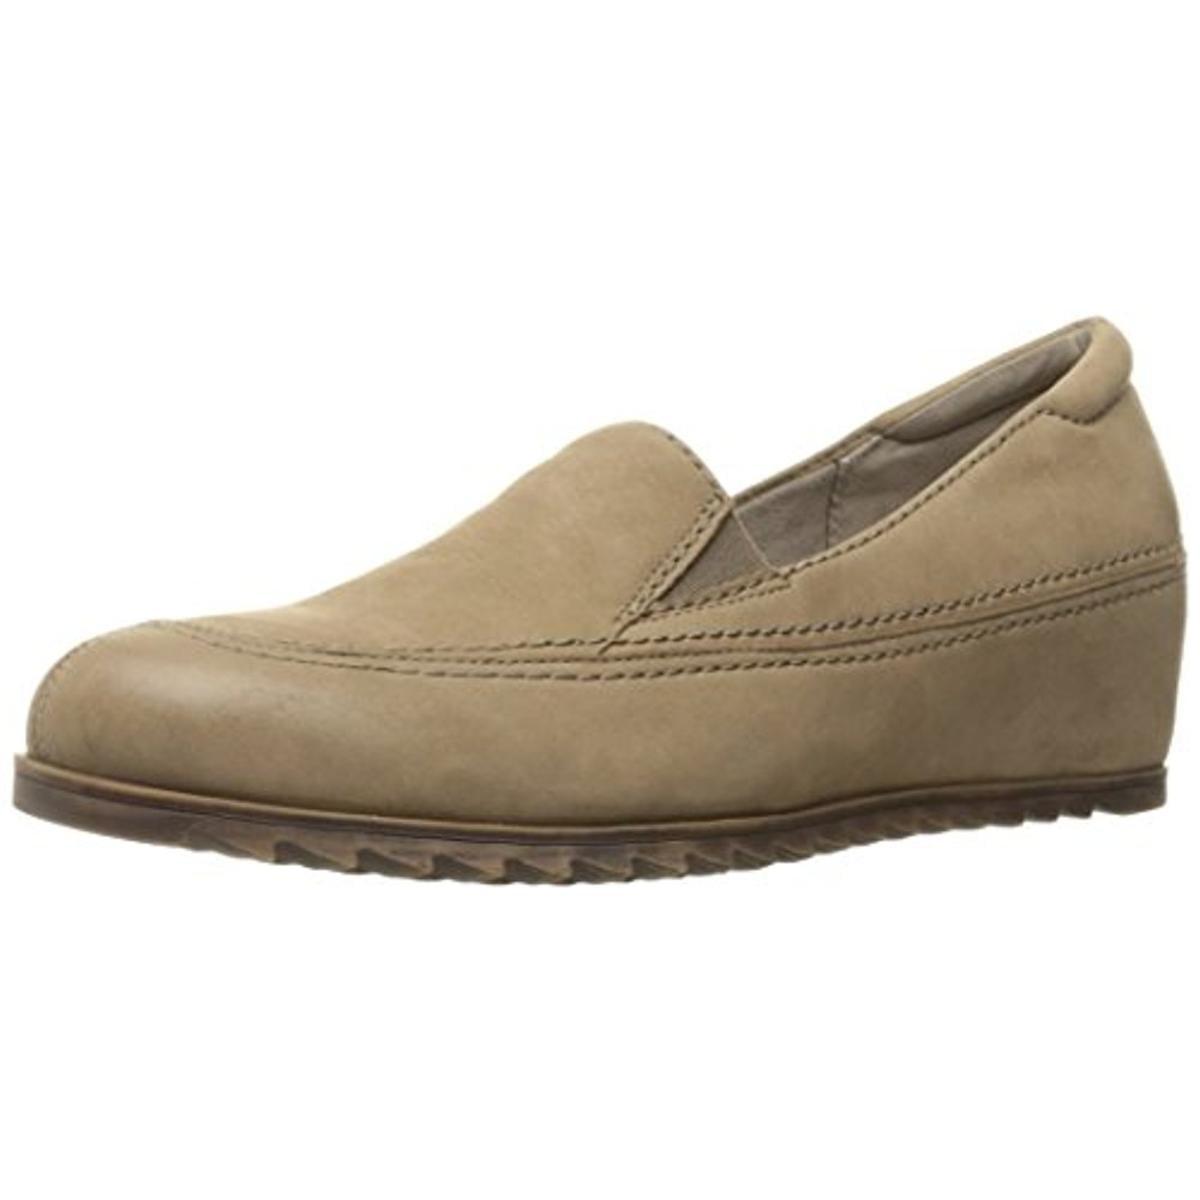 Naturalizer Wedge Womens Harker Nubuck Hidden Wedge Naturalizer Loafers 575c38